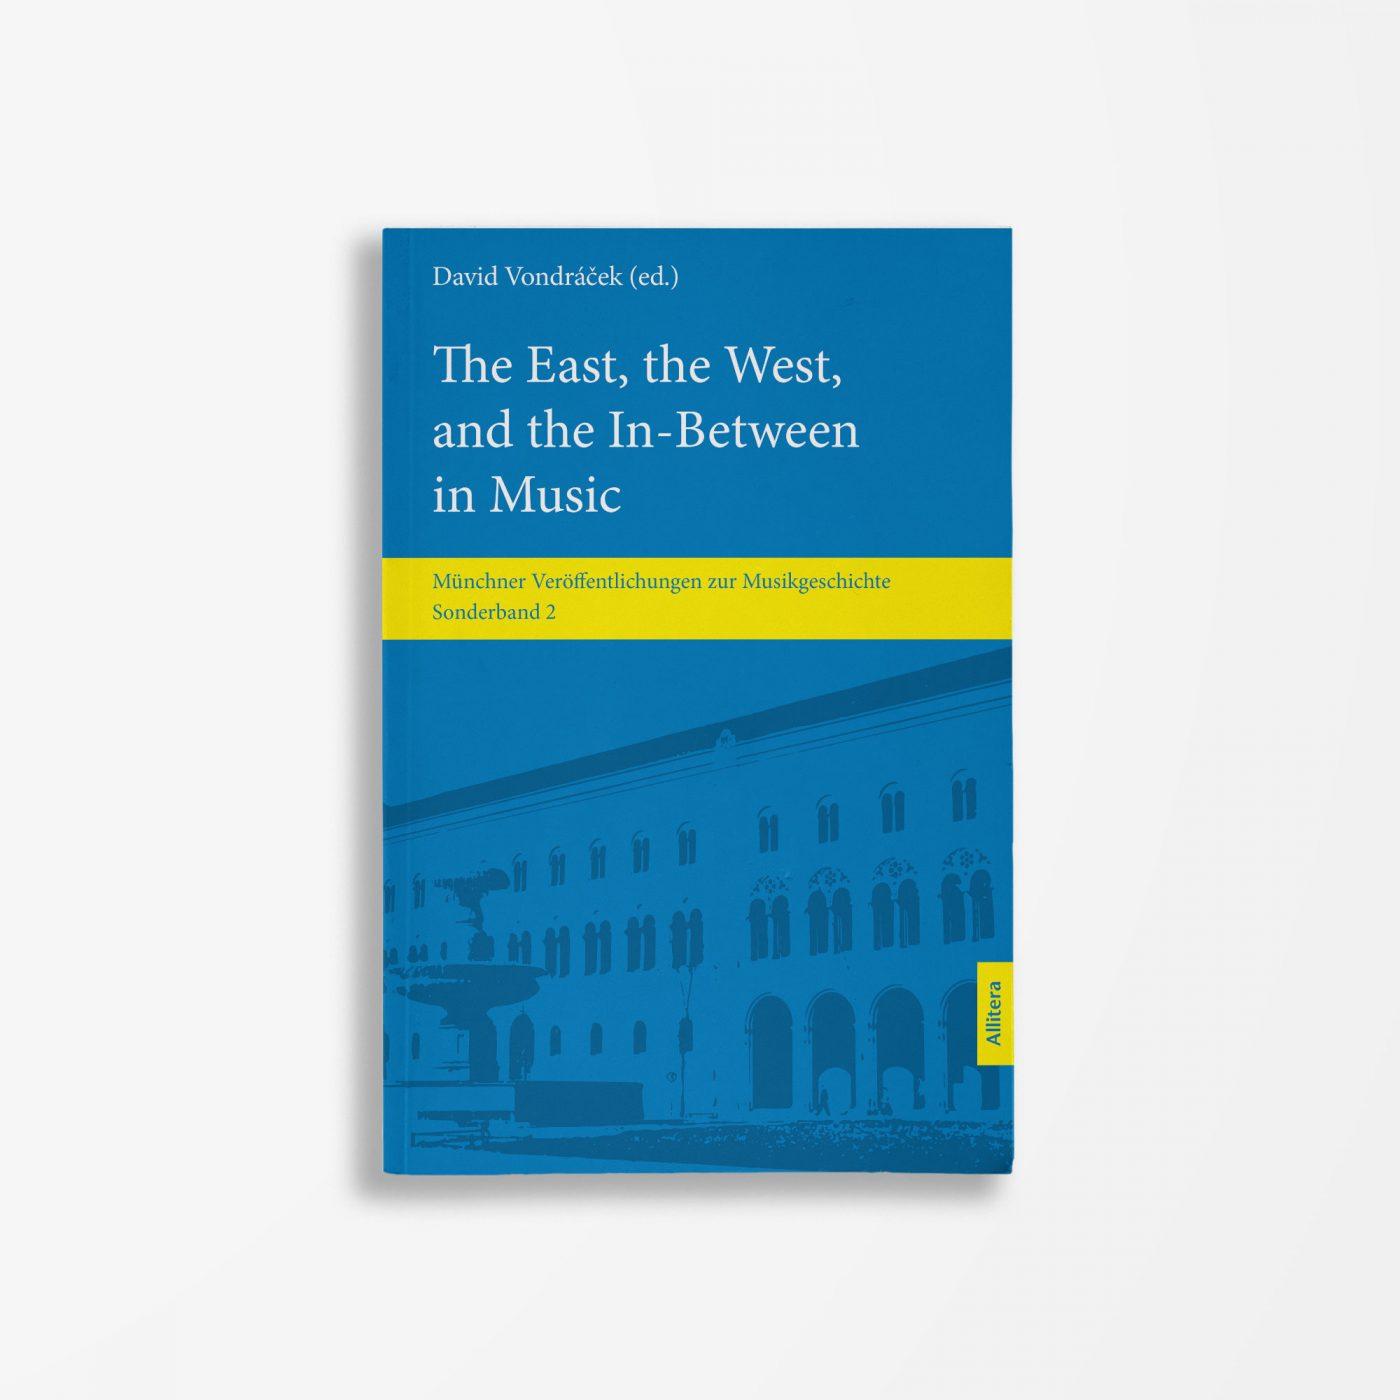 Buchcover David Vondracek The East, the West, and the In-Between